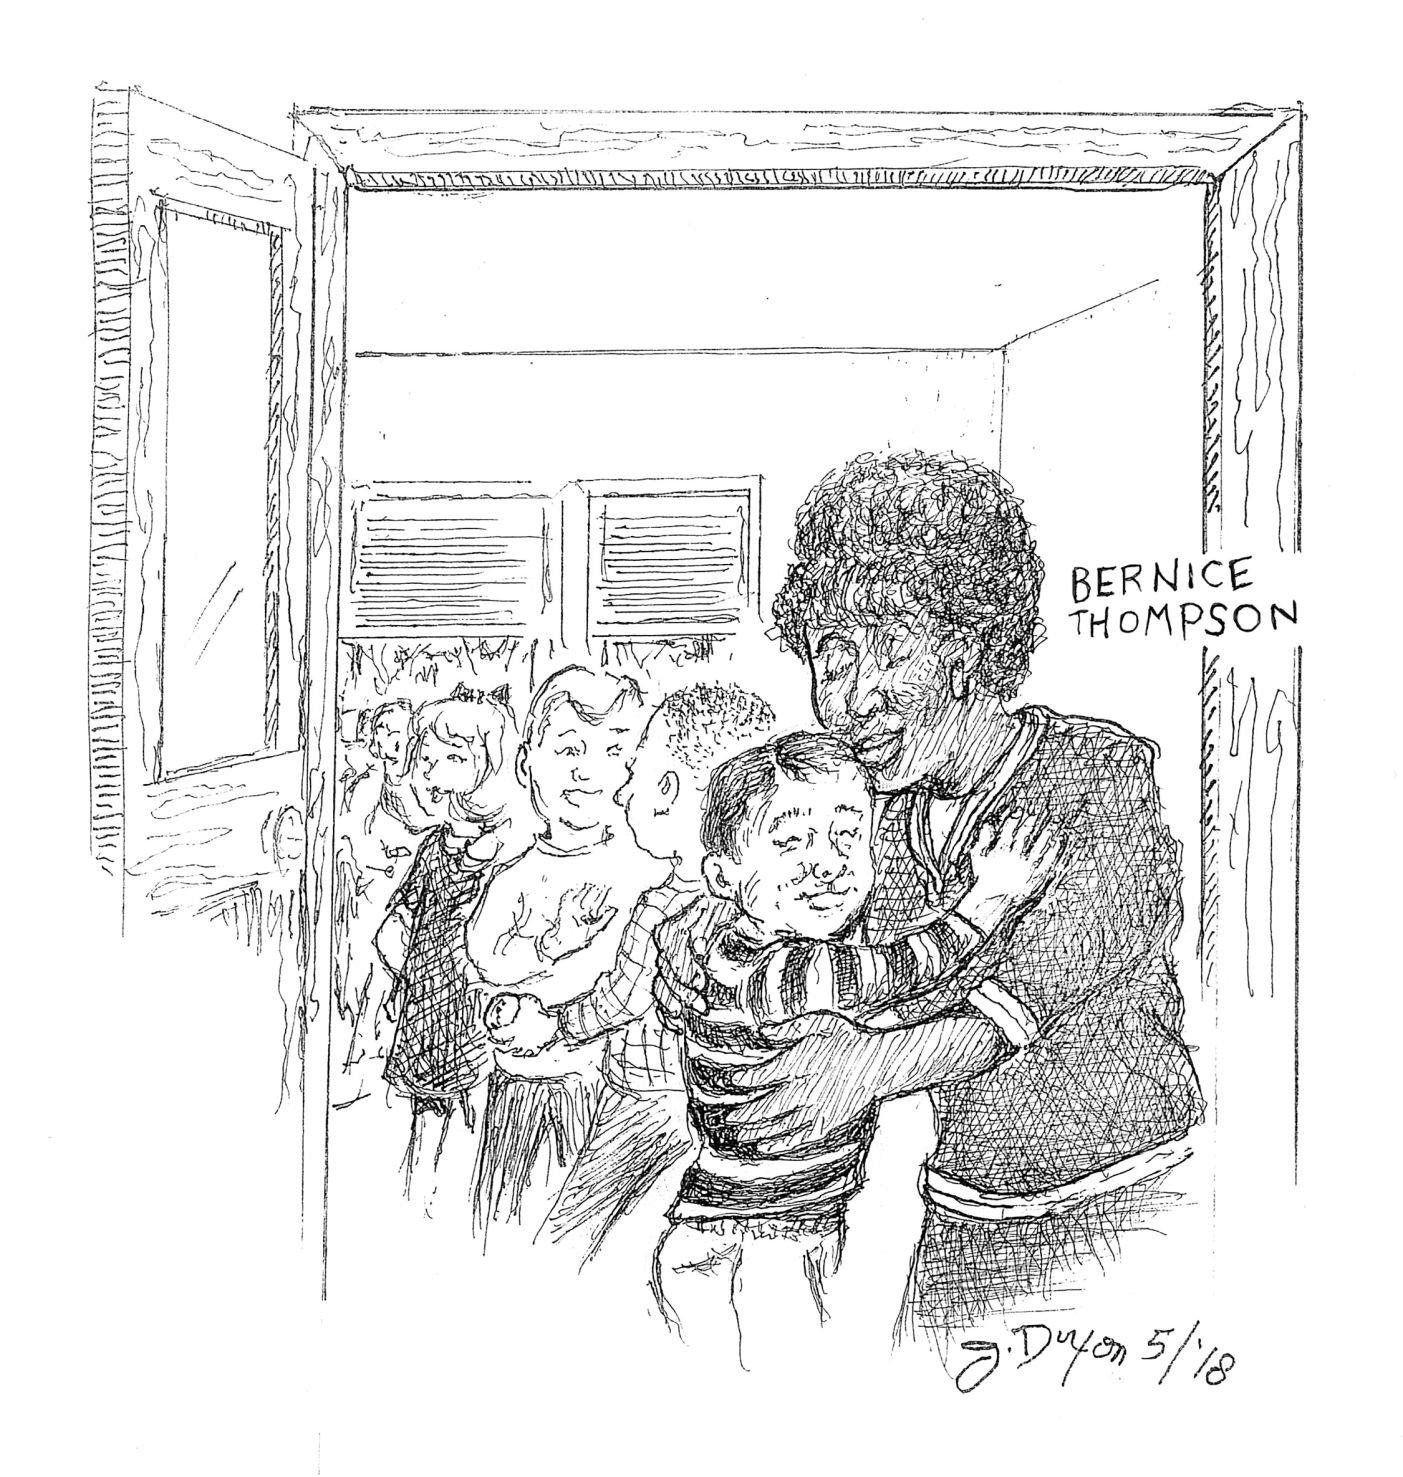 Quartet of black teachers made integration a gentle